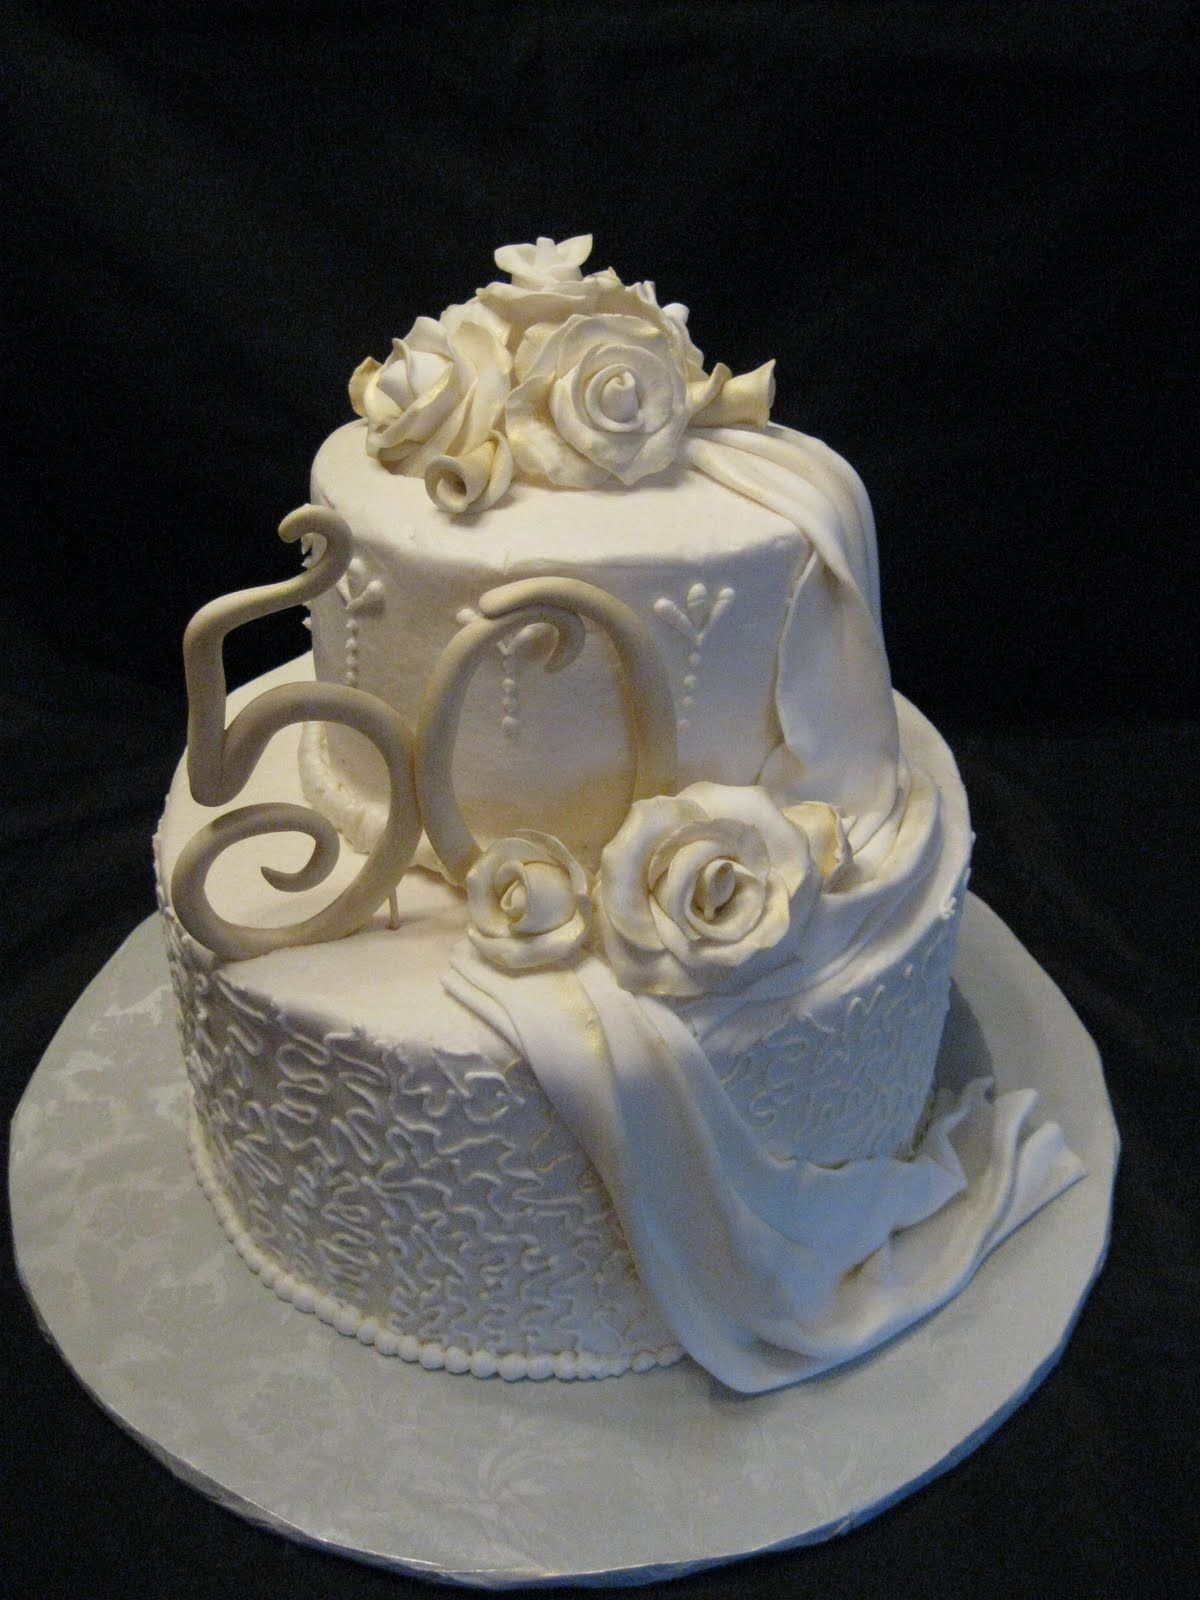 50th Anniversary 50th anniversary cakes, 50th wedding